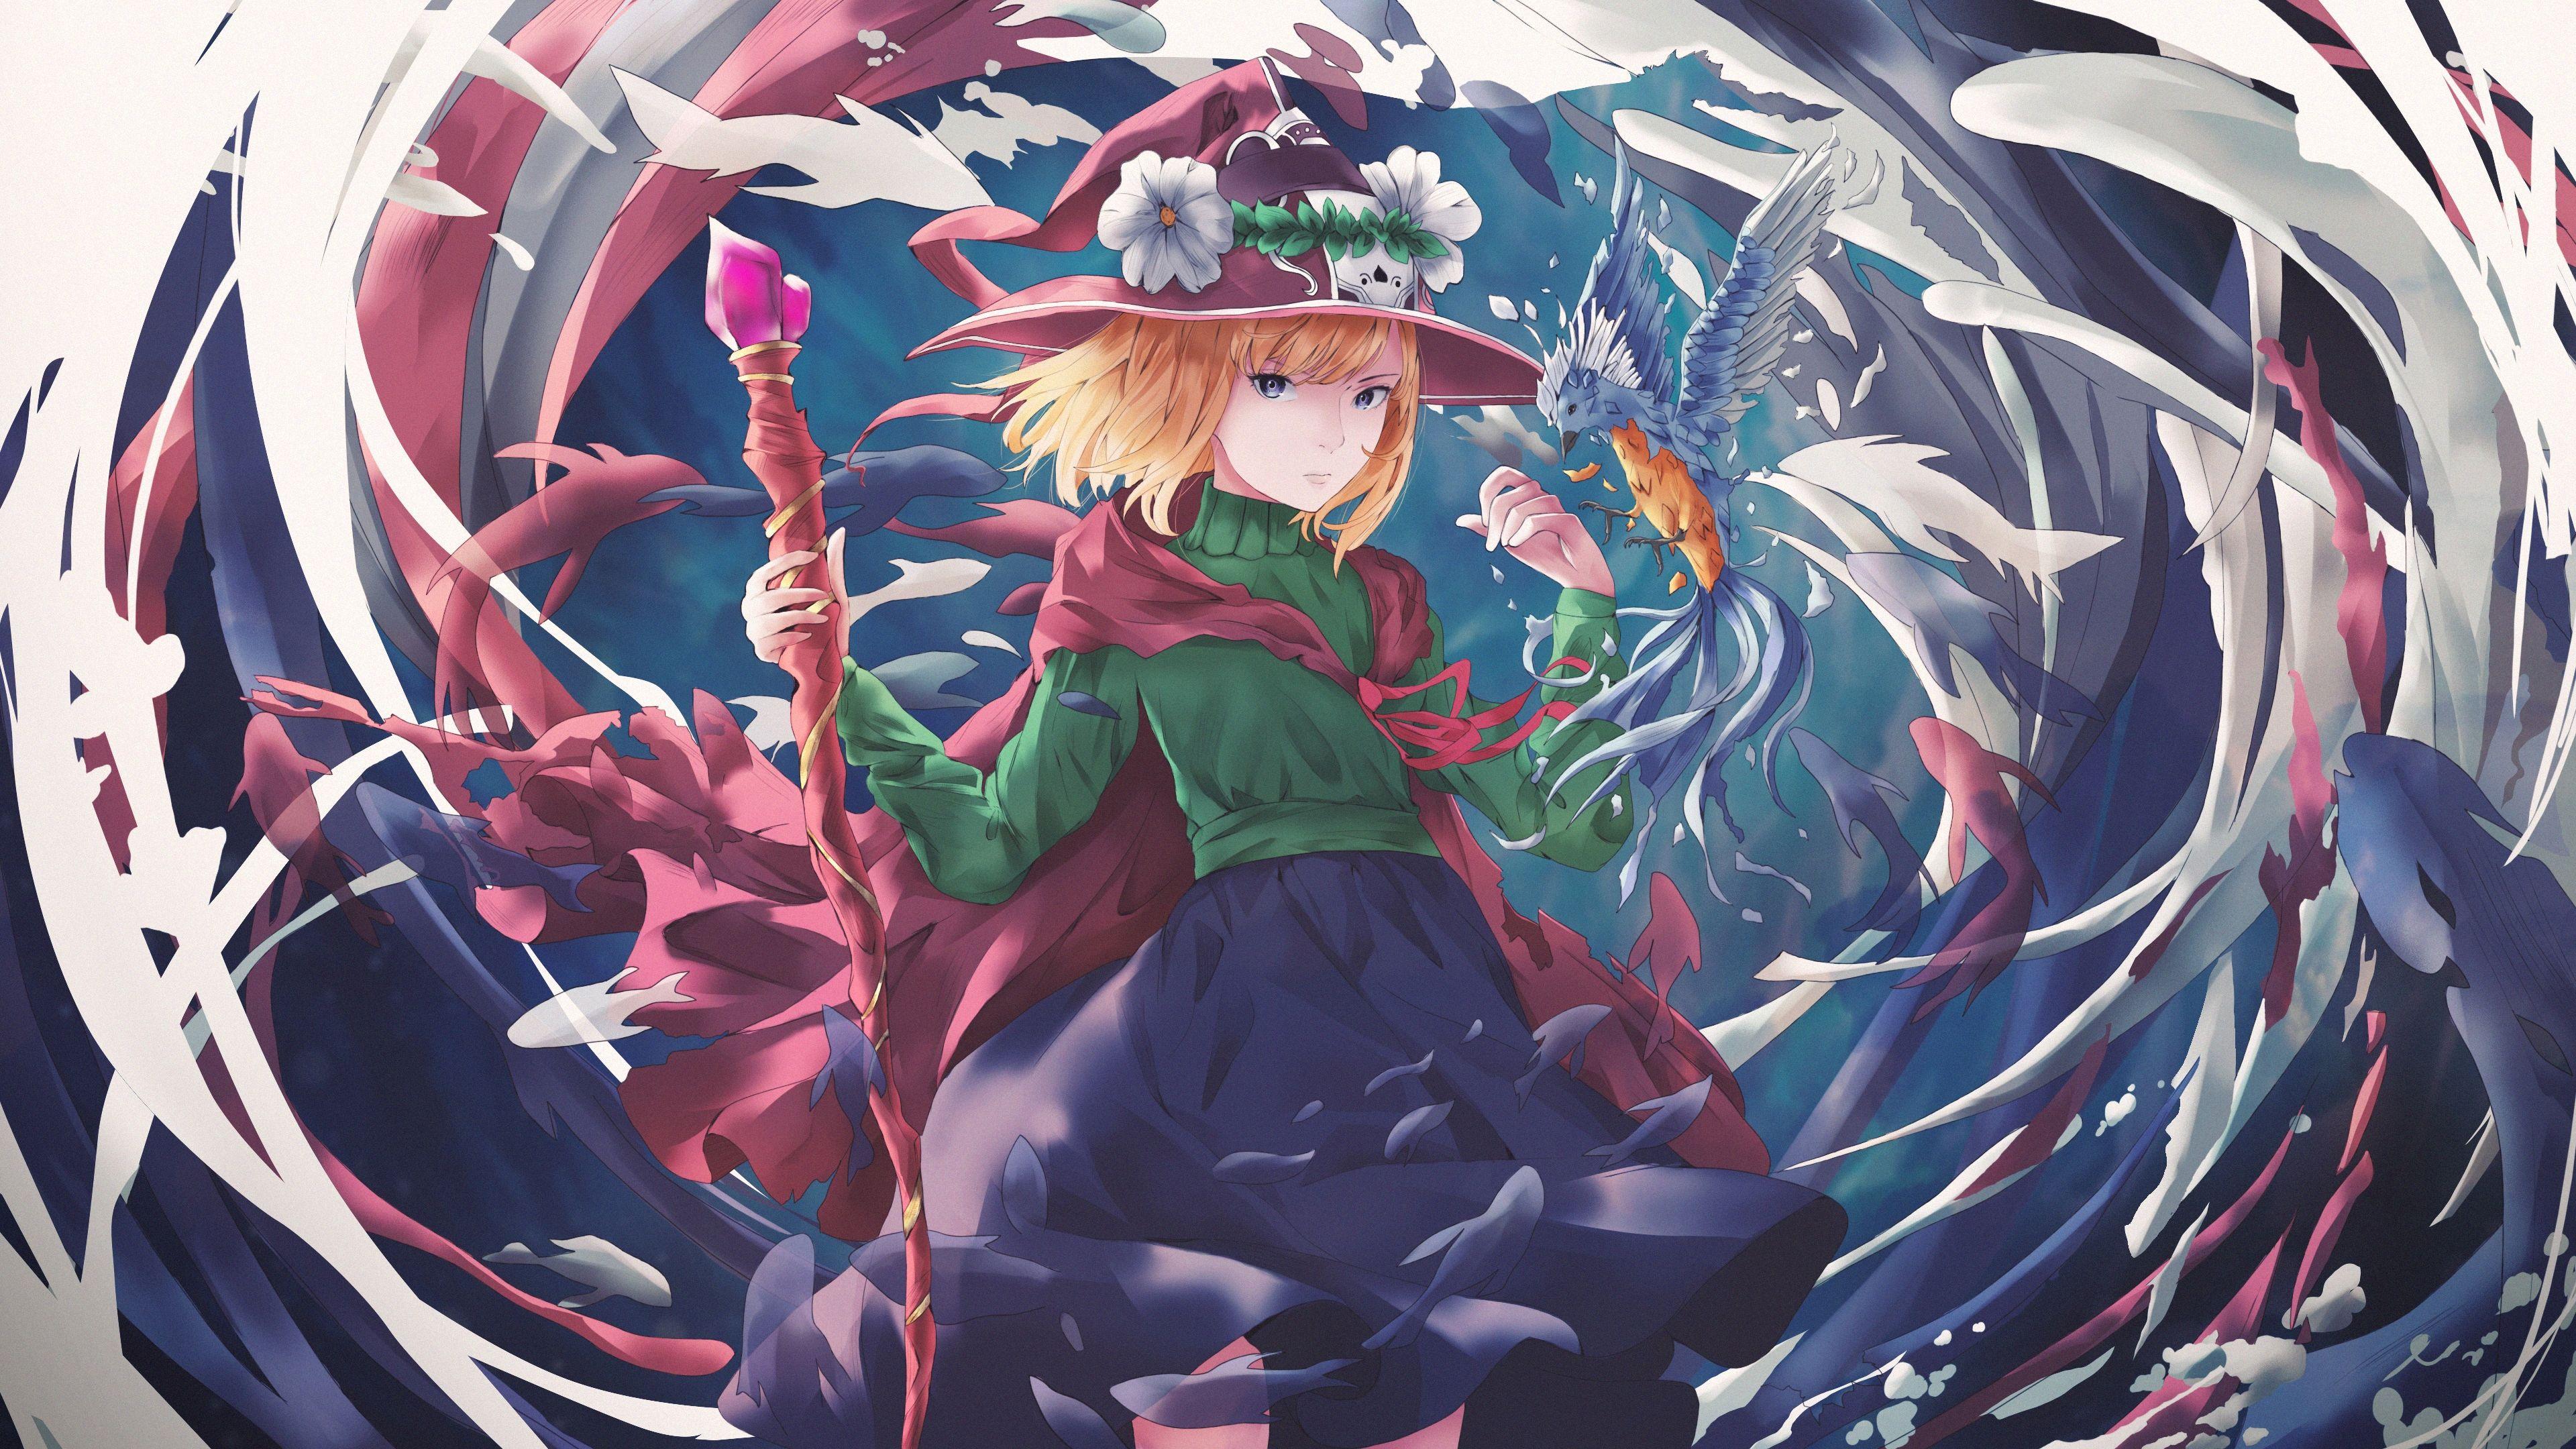 Download 3840x2160 Anime Witch Girl, Blonde, Staff, Bird